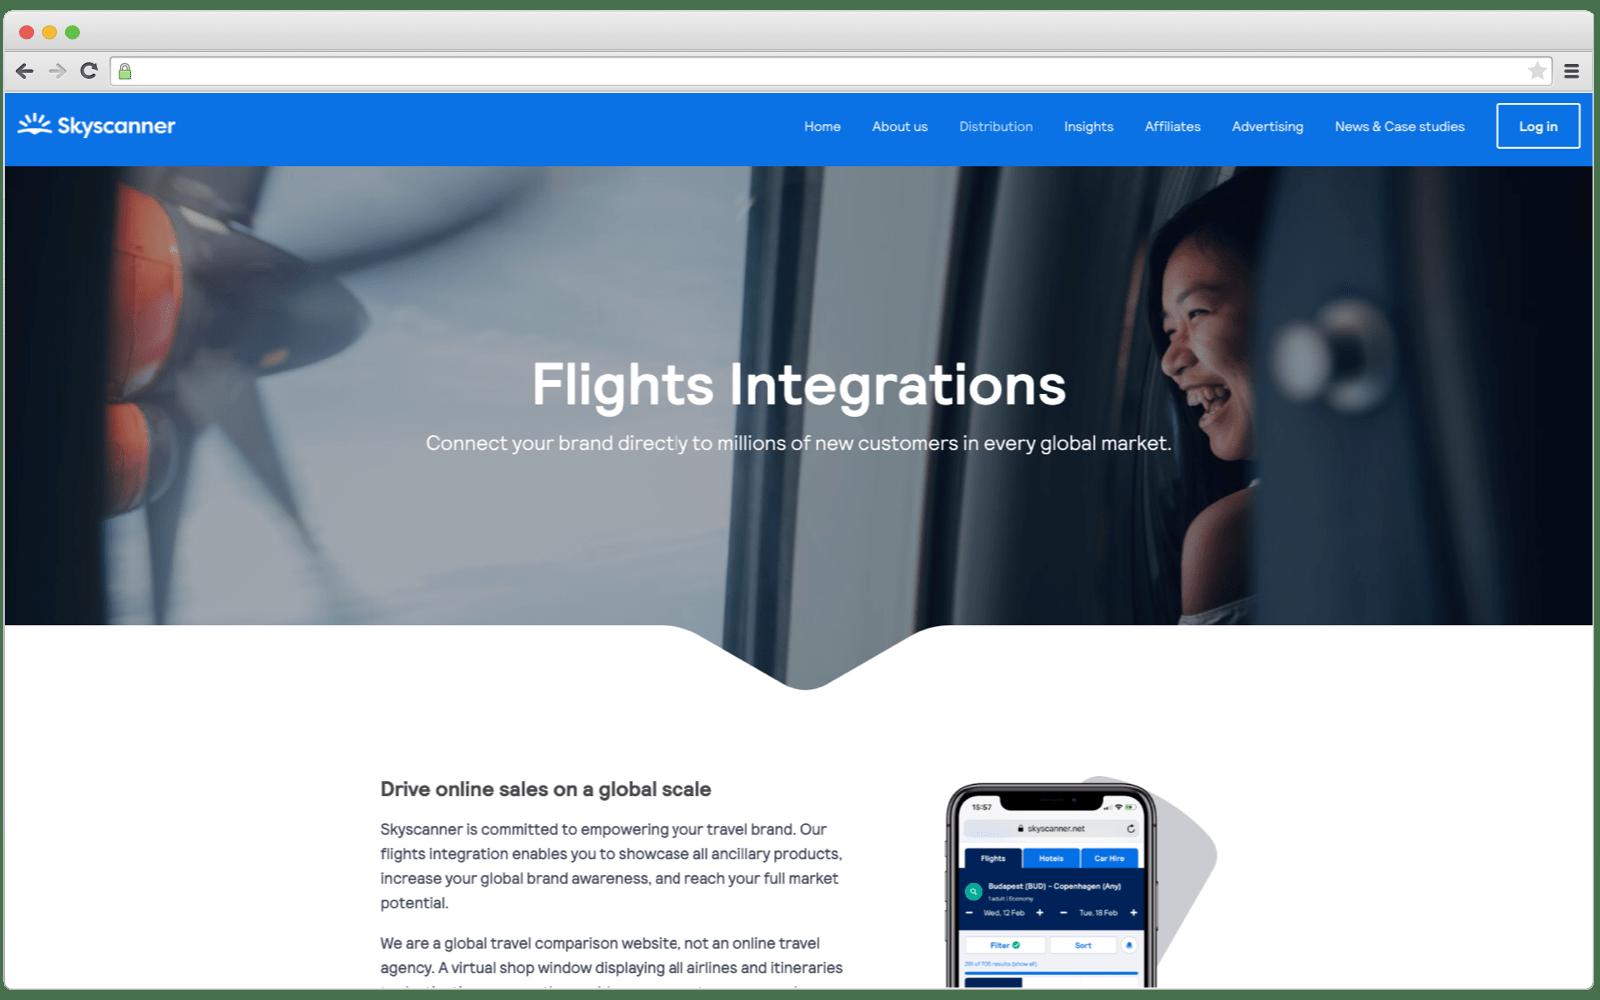 Skyscanner flghts API